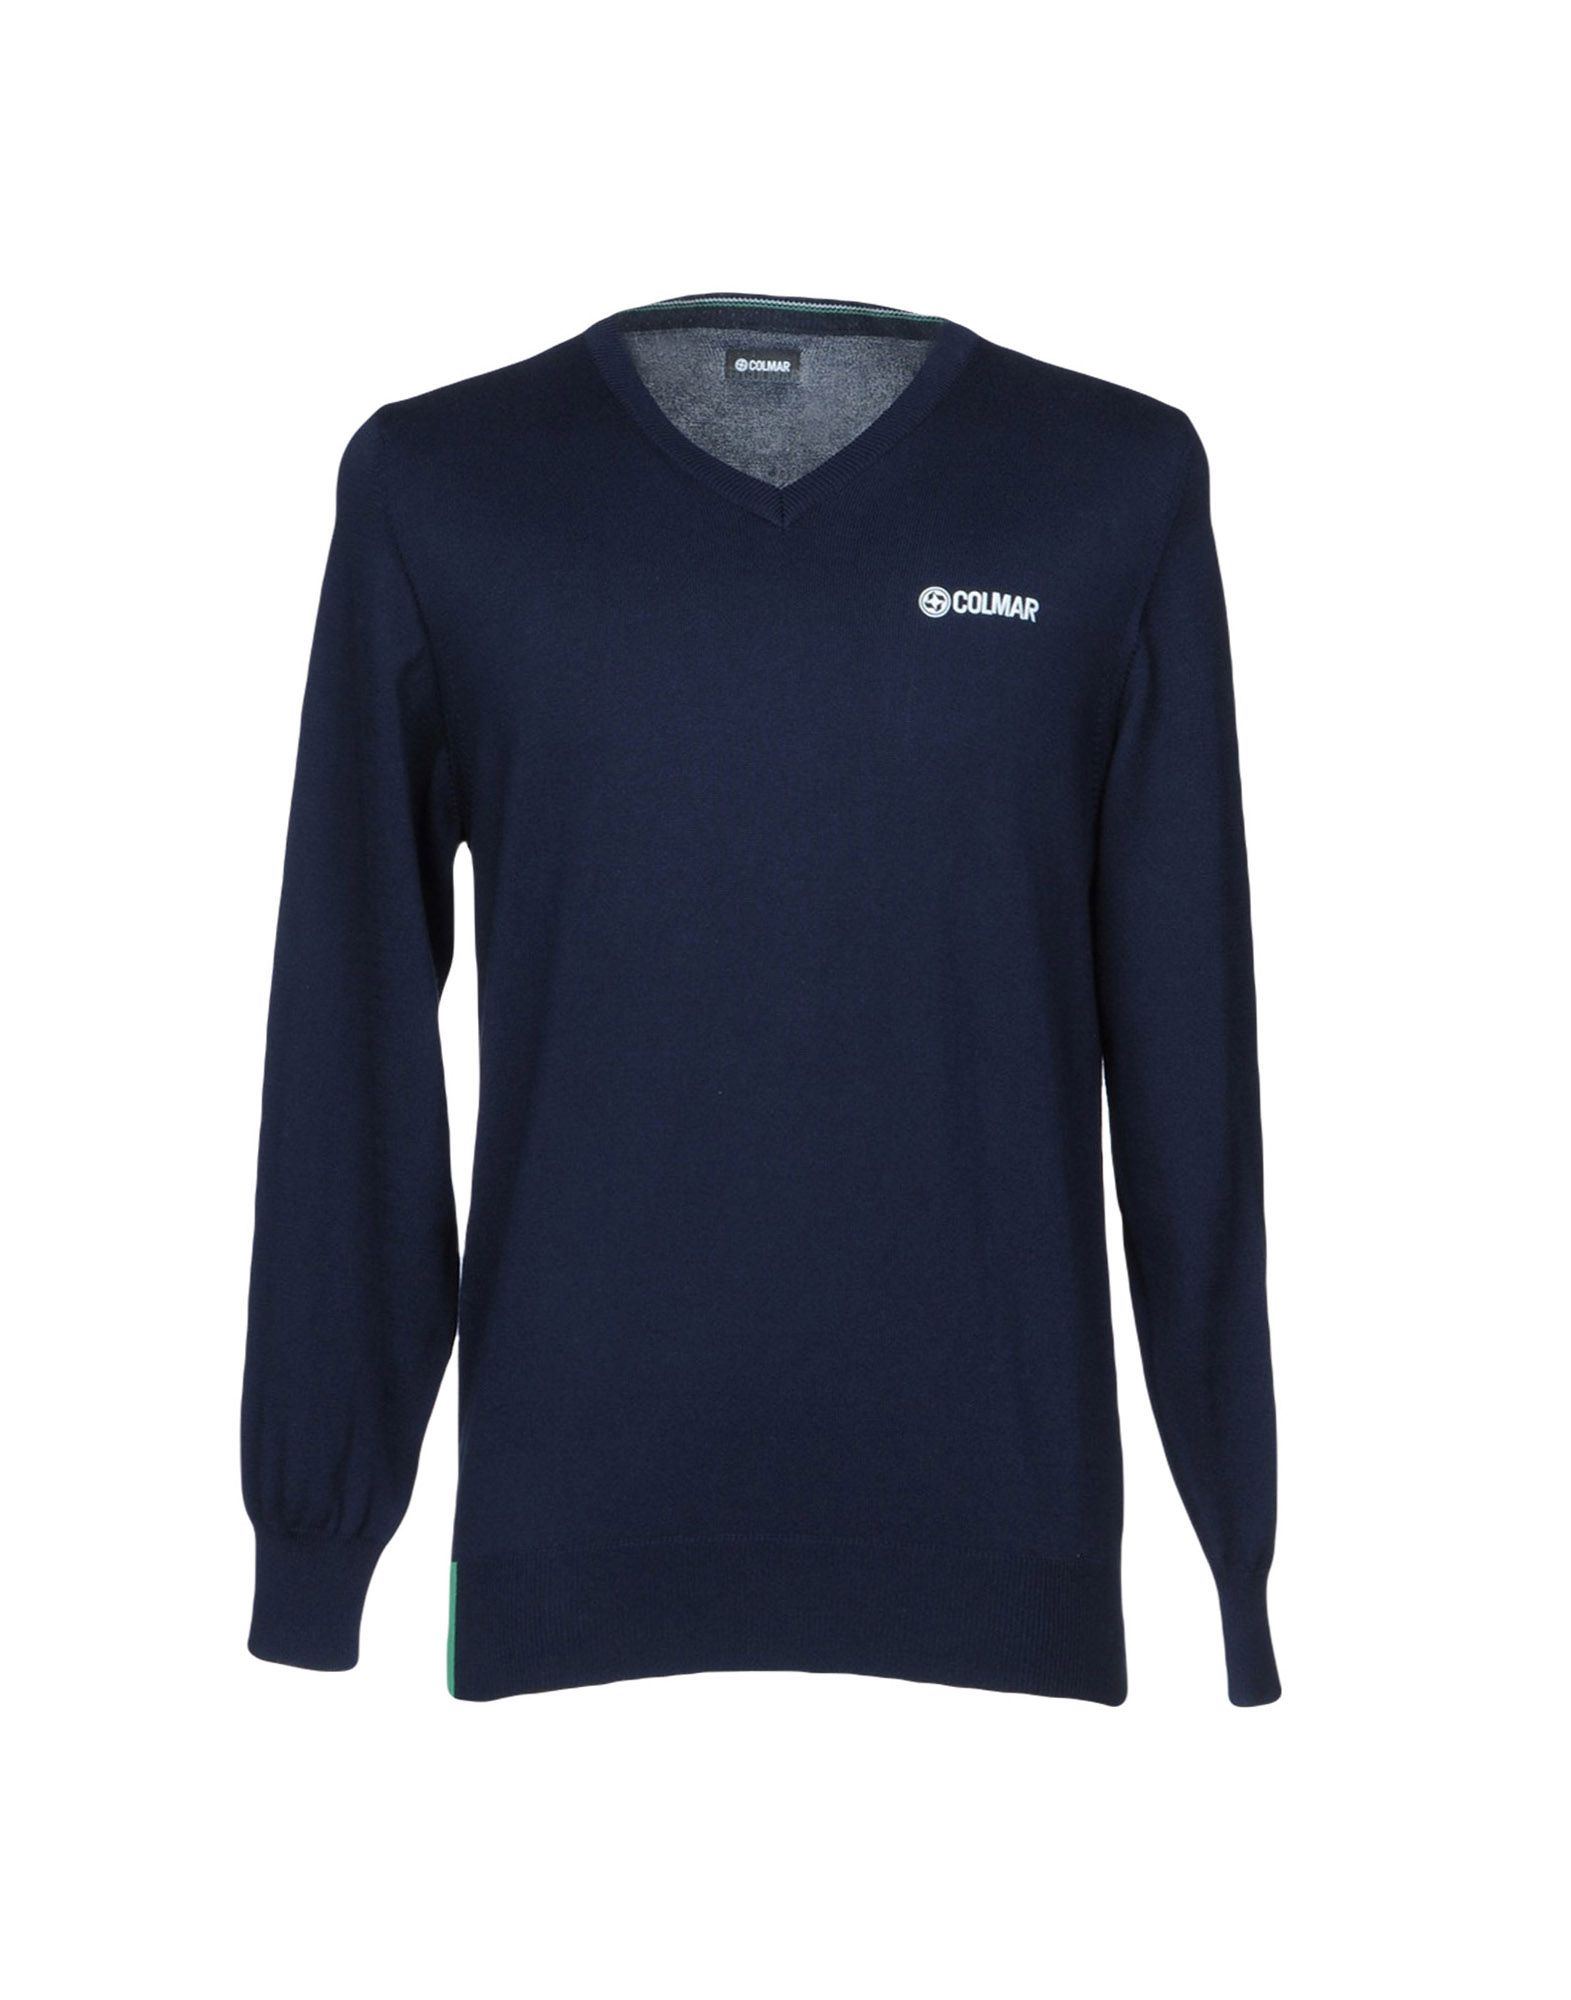 ФОТО colmar свитер